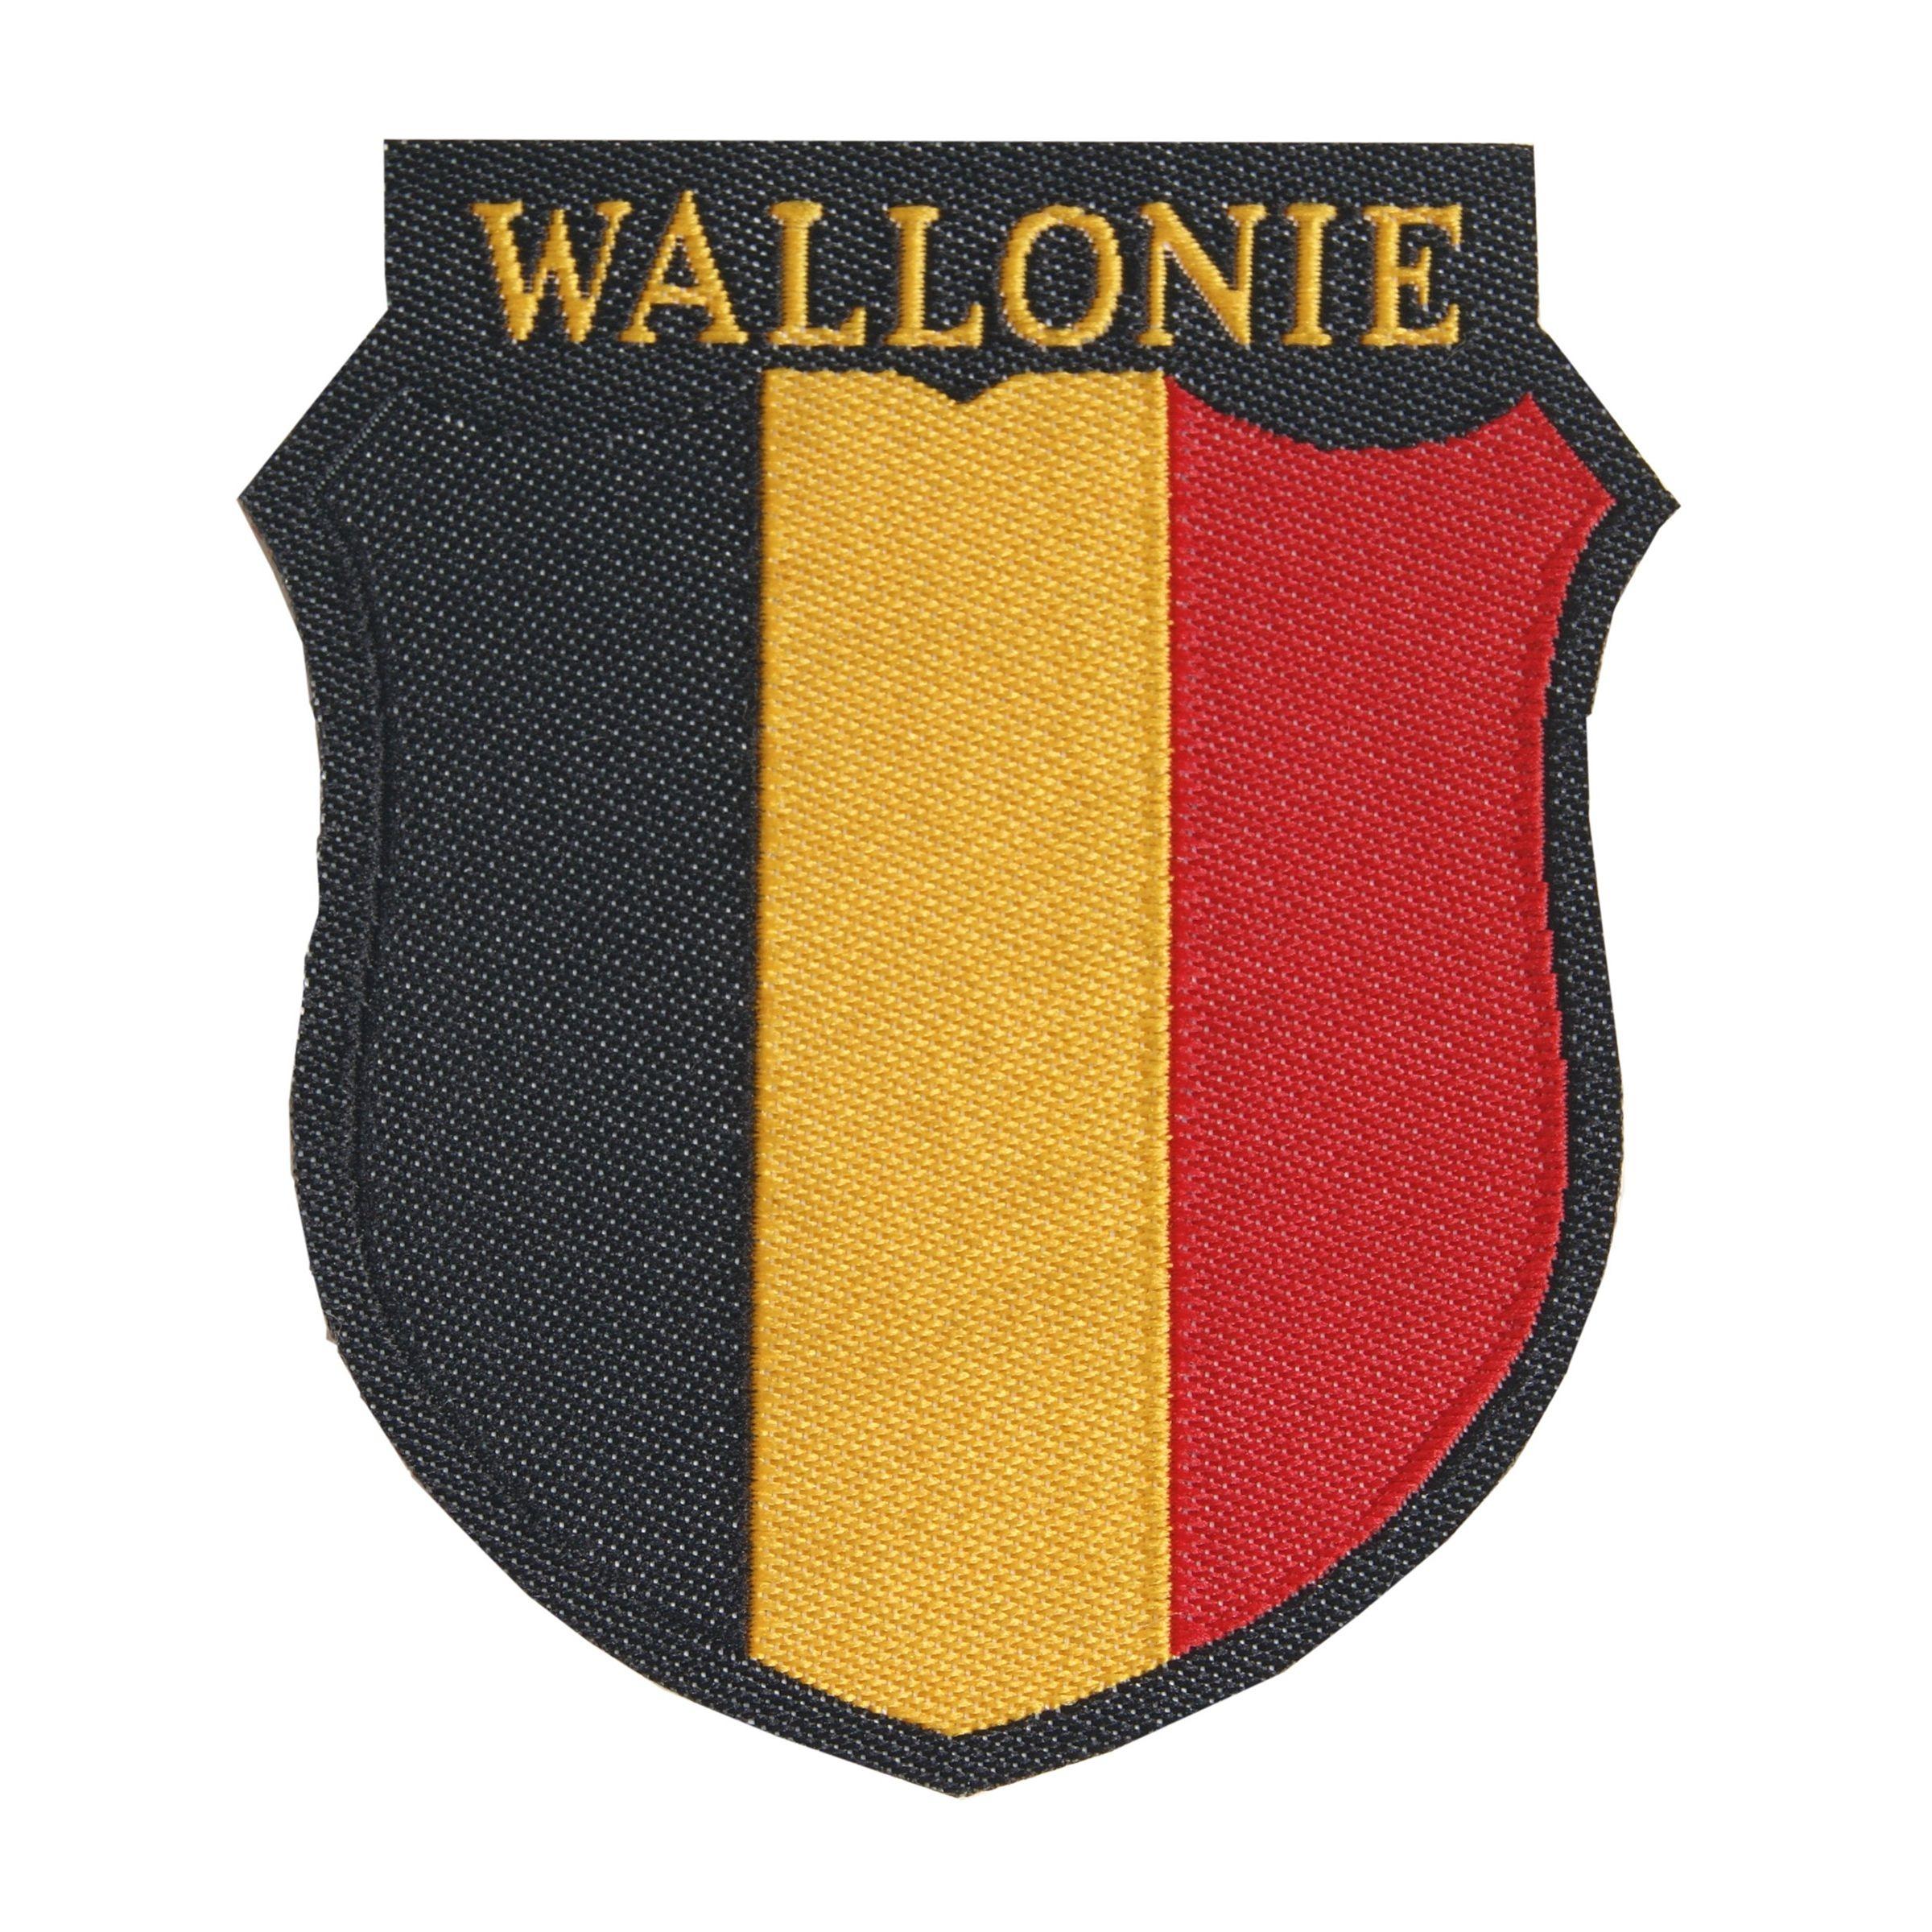 Wallonie patch - BeVo - repro